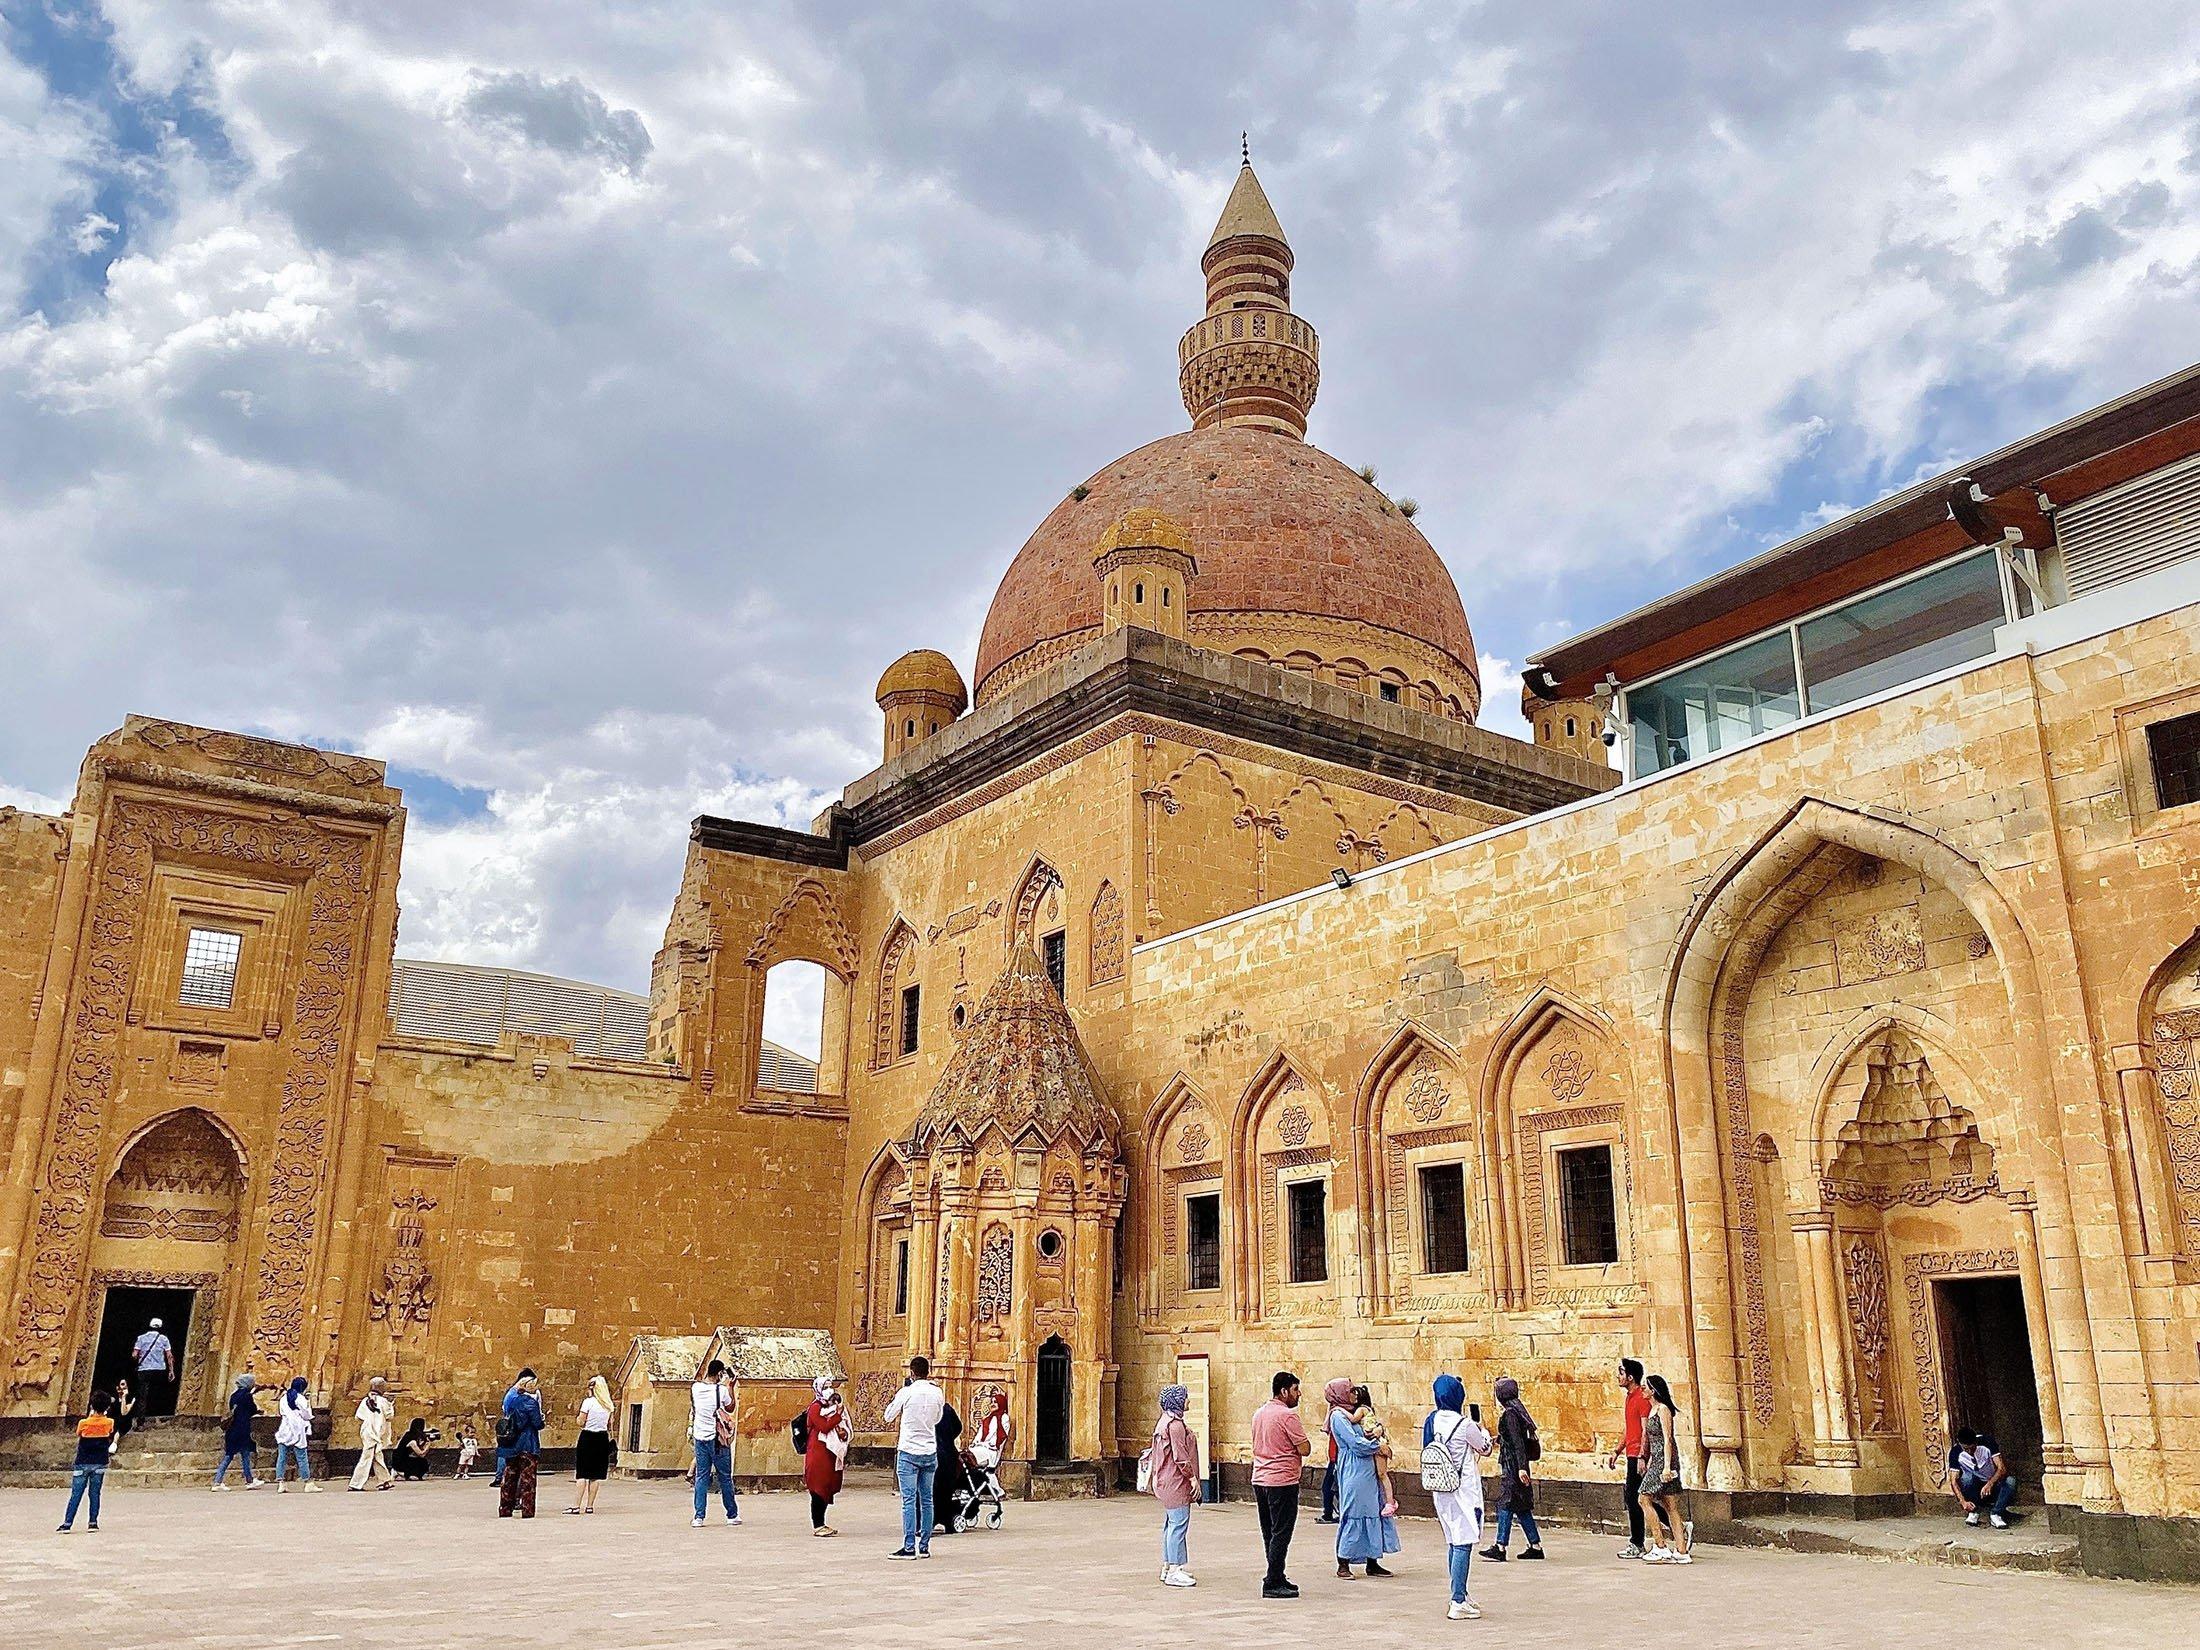 People wander in the courtyard of the Ishak Pasha Palace can be seen from afar inthe Doğubayazıt district of Ağrı, Turkey, July 30, 2021. (IHA Photo)